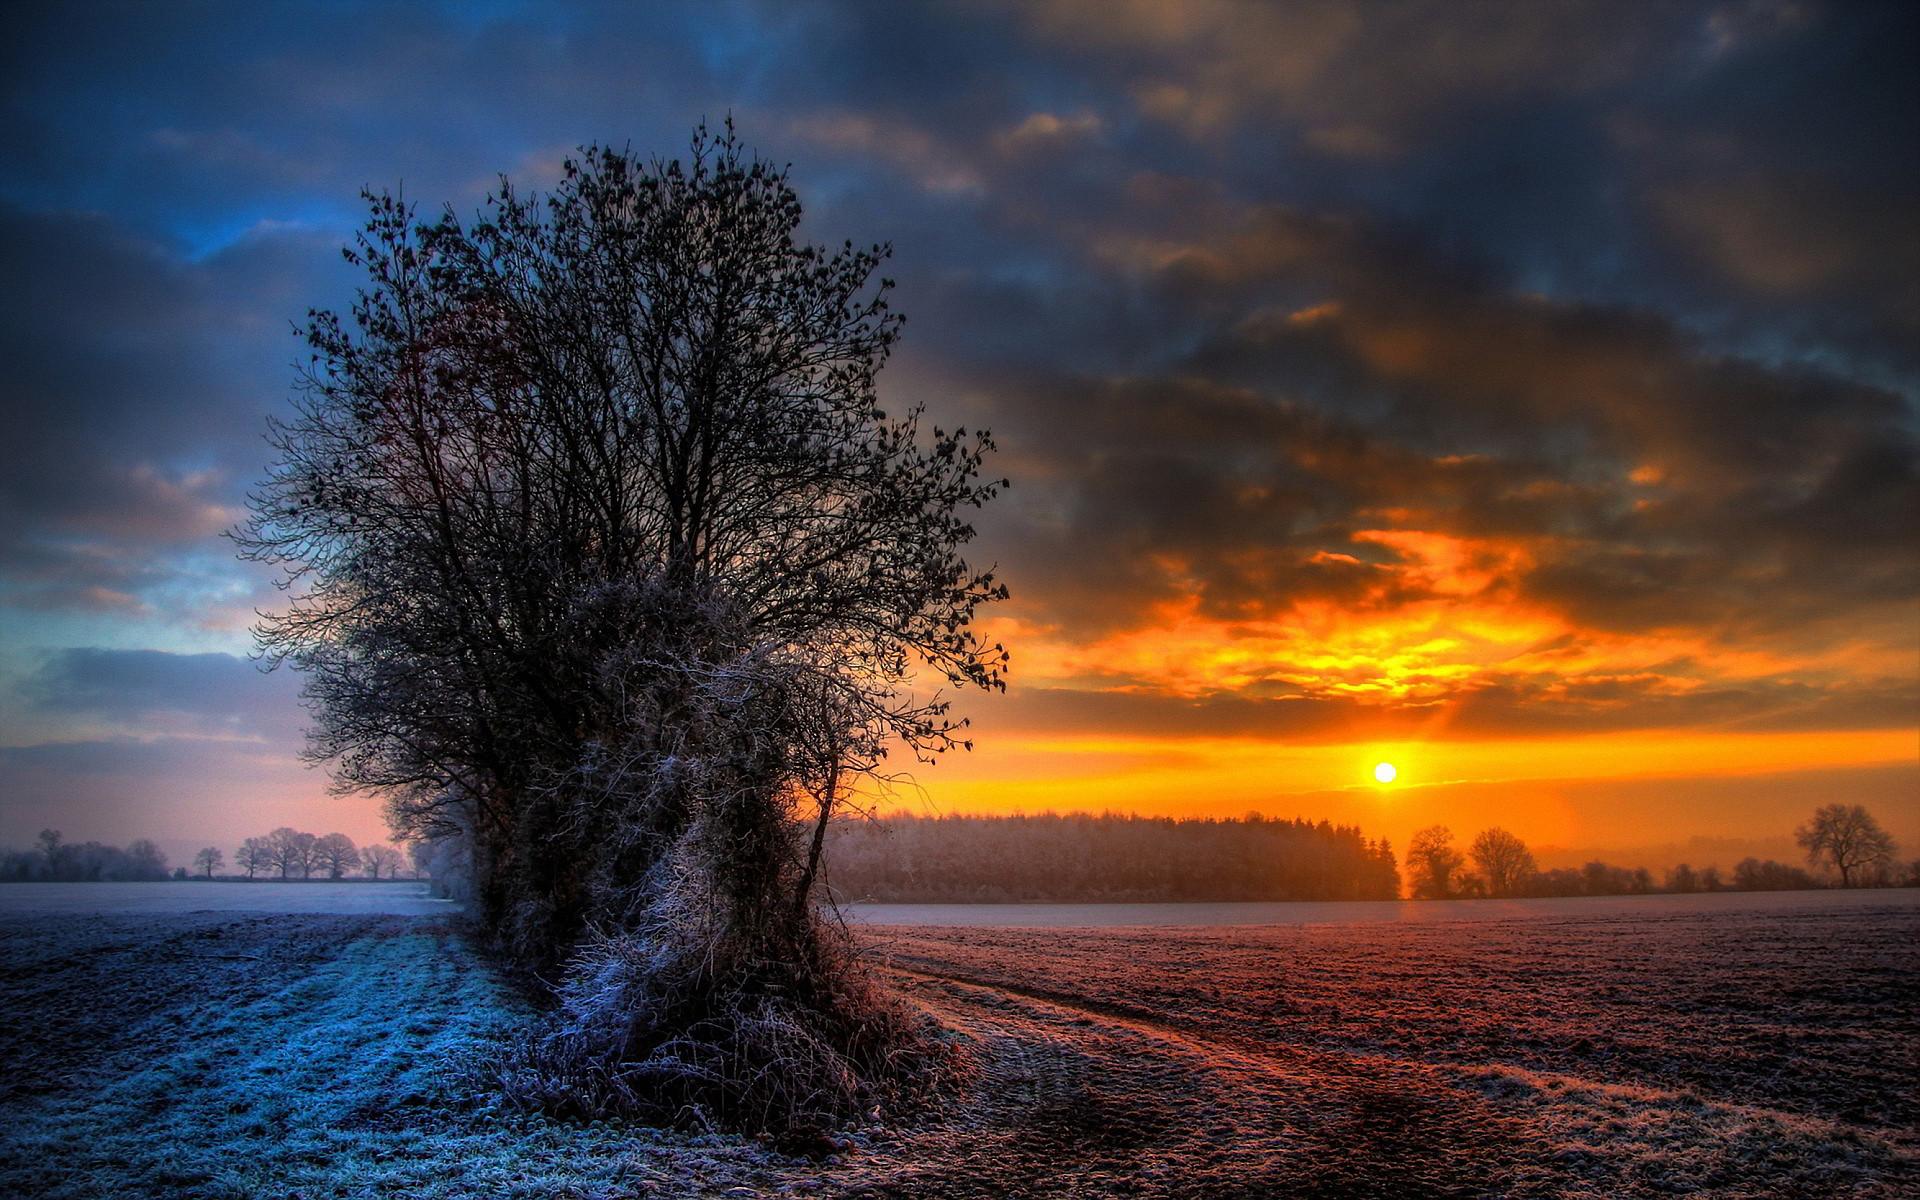 sunset on fields in winter – Desktop Nexus Wallpapers